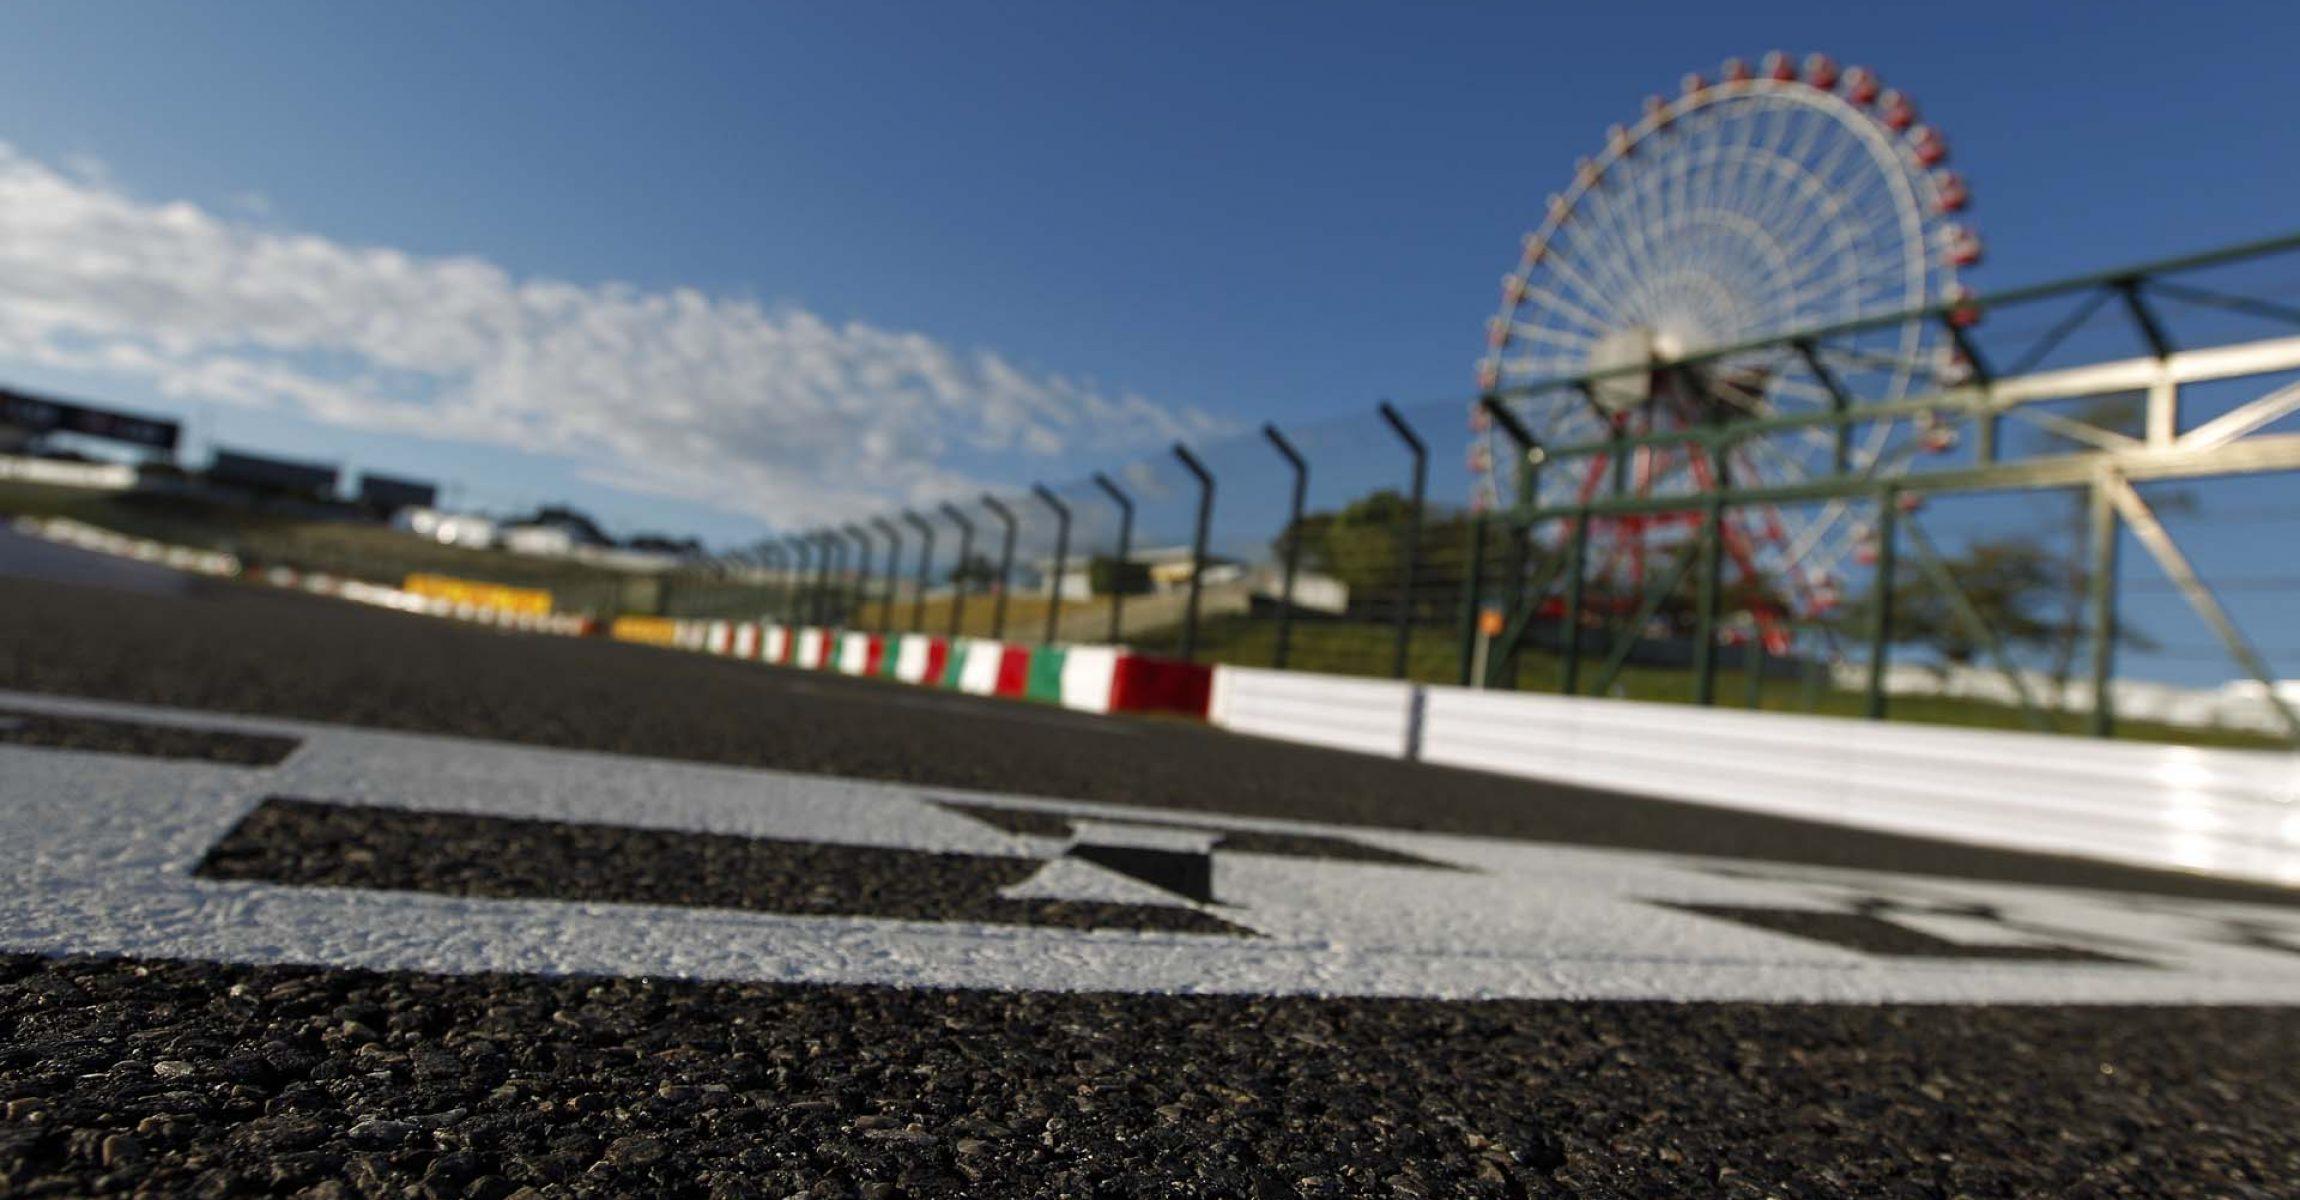 MOTORSPORT - F1 2012 - GRAND PRIX OF JAPAN - SUZUKA - 4 TO 7/10/2012 - PHOTO : FRAN«OIS FLAMAND / DPPI - AMBIANCE TRACK